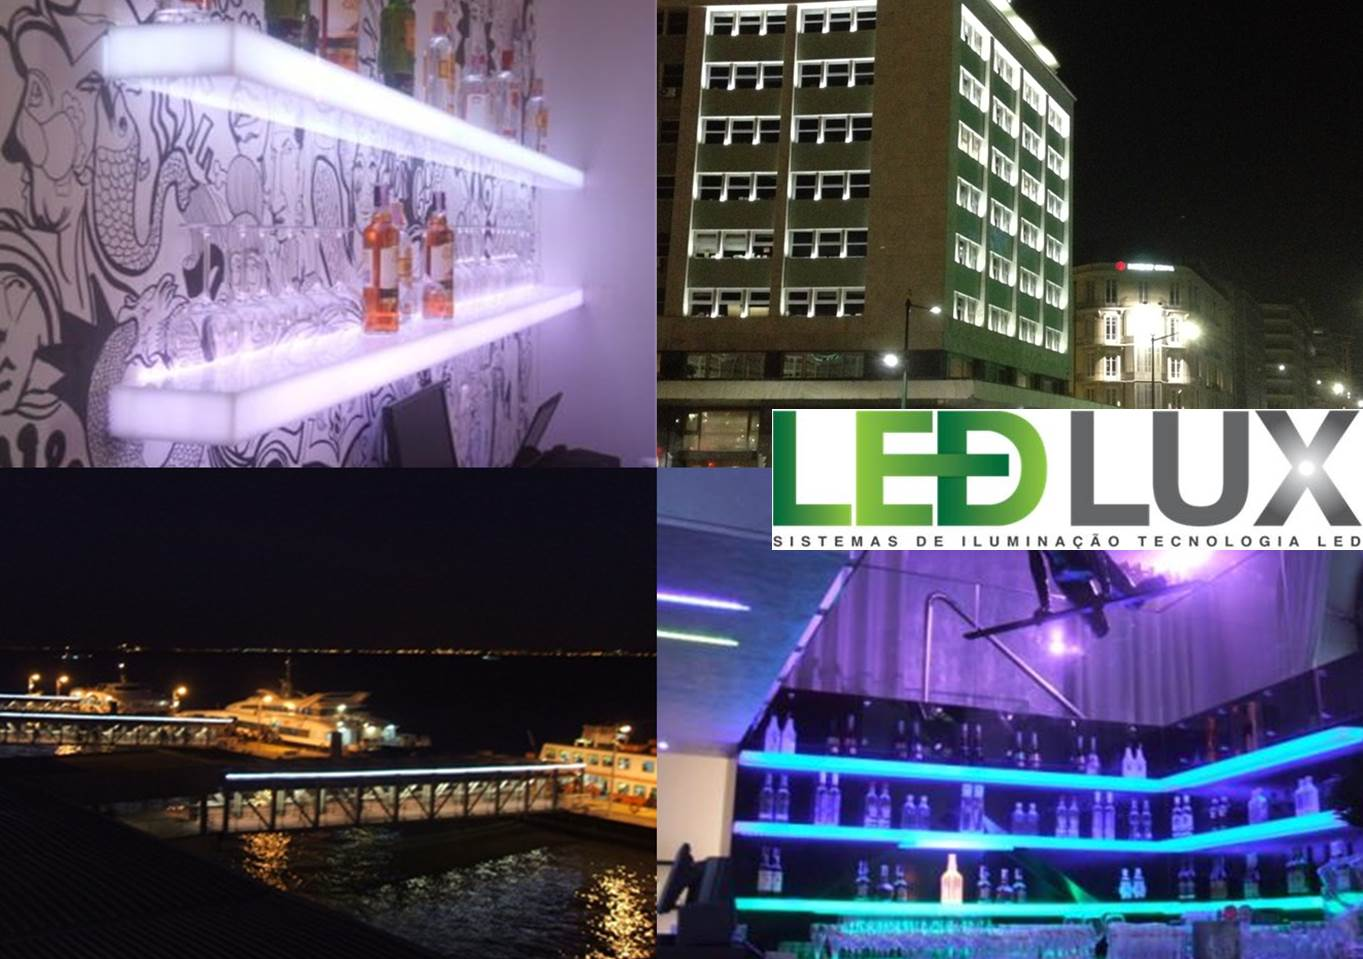 LEDLUX I EFICIENCIA ENERGÉTICA EN ILUMINACIÓN